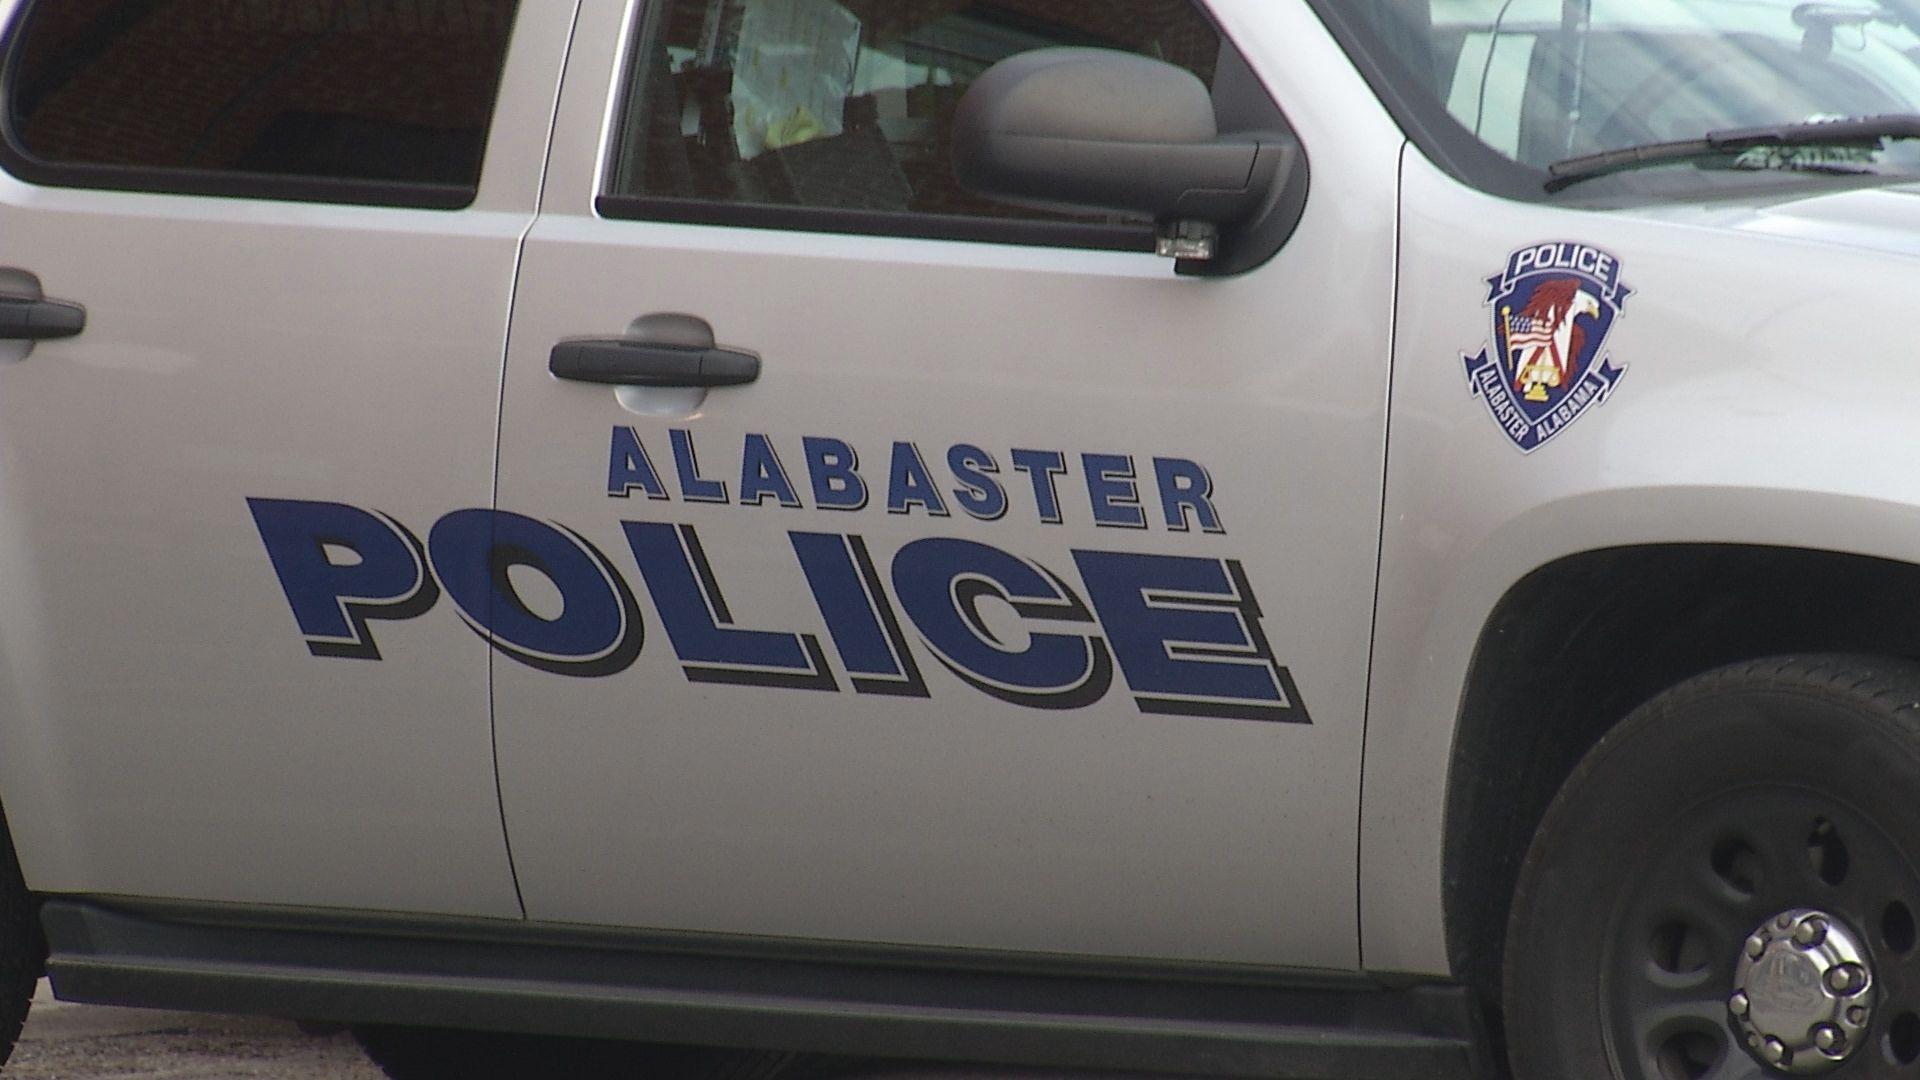 alabaster police00000000_1529981192625.jpg.jpg